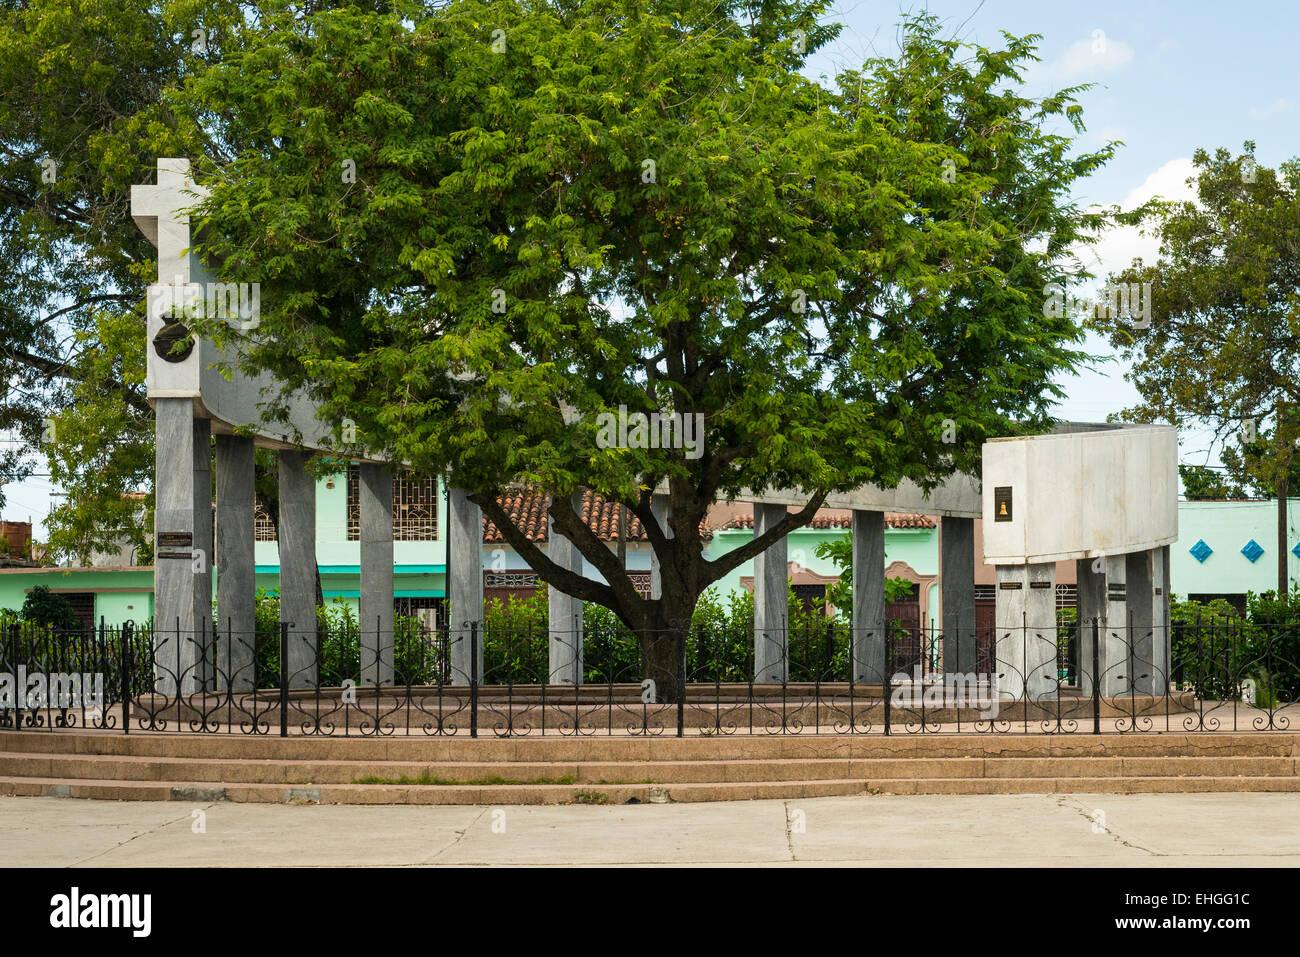 Cuba Parque Tudury monument foundation Santa Clara round tamarind tree 18 columns of 1st families site 1st mass - Stock Image